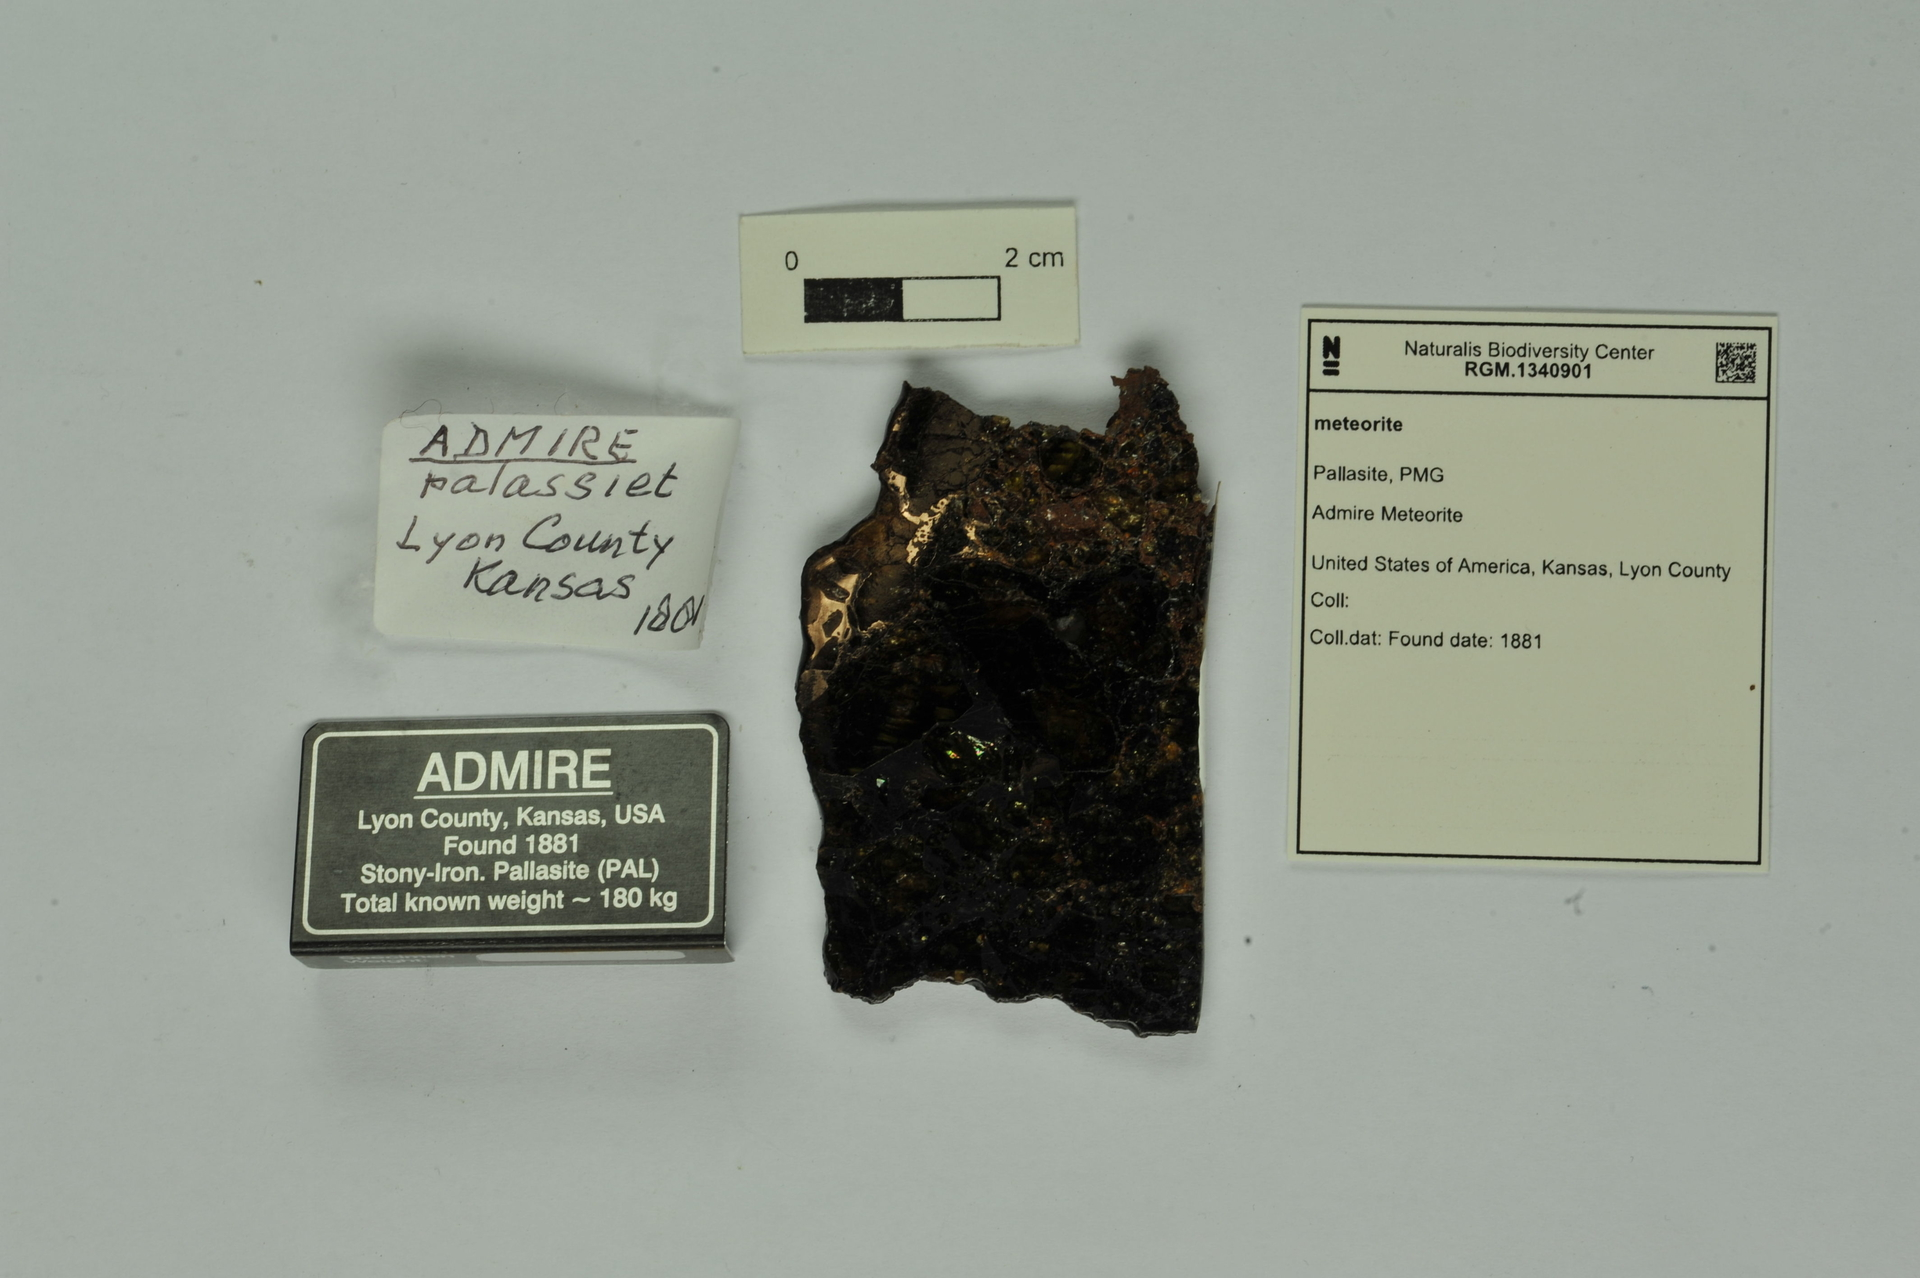 RGM.1340901 | Pallasite, PMG